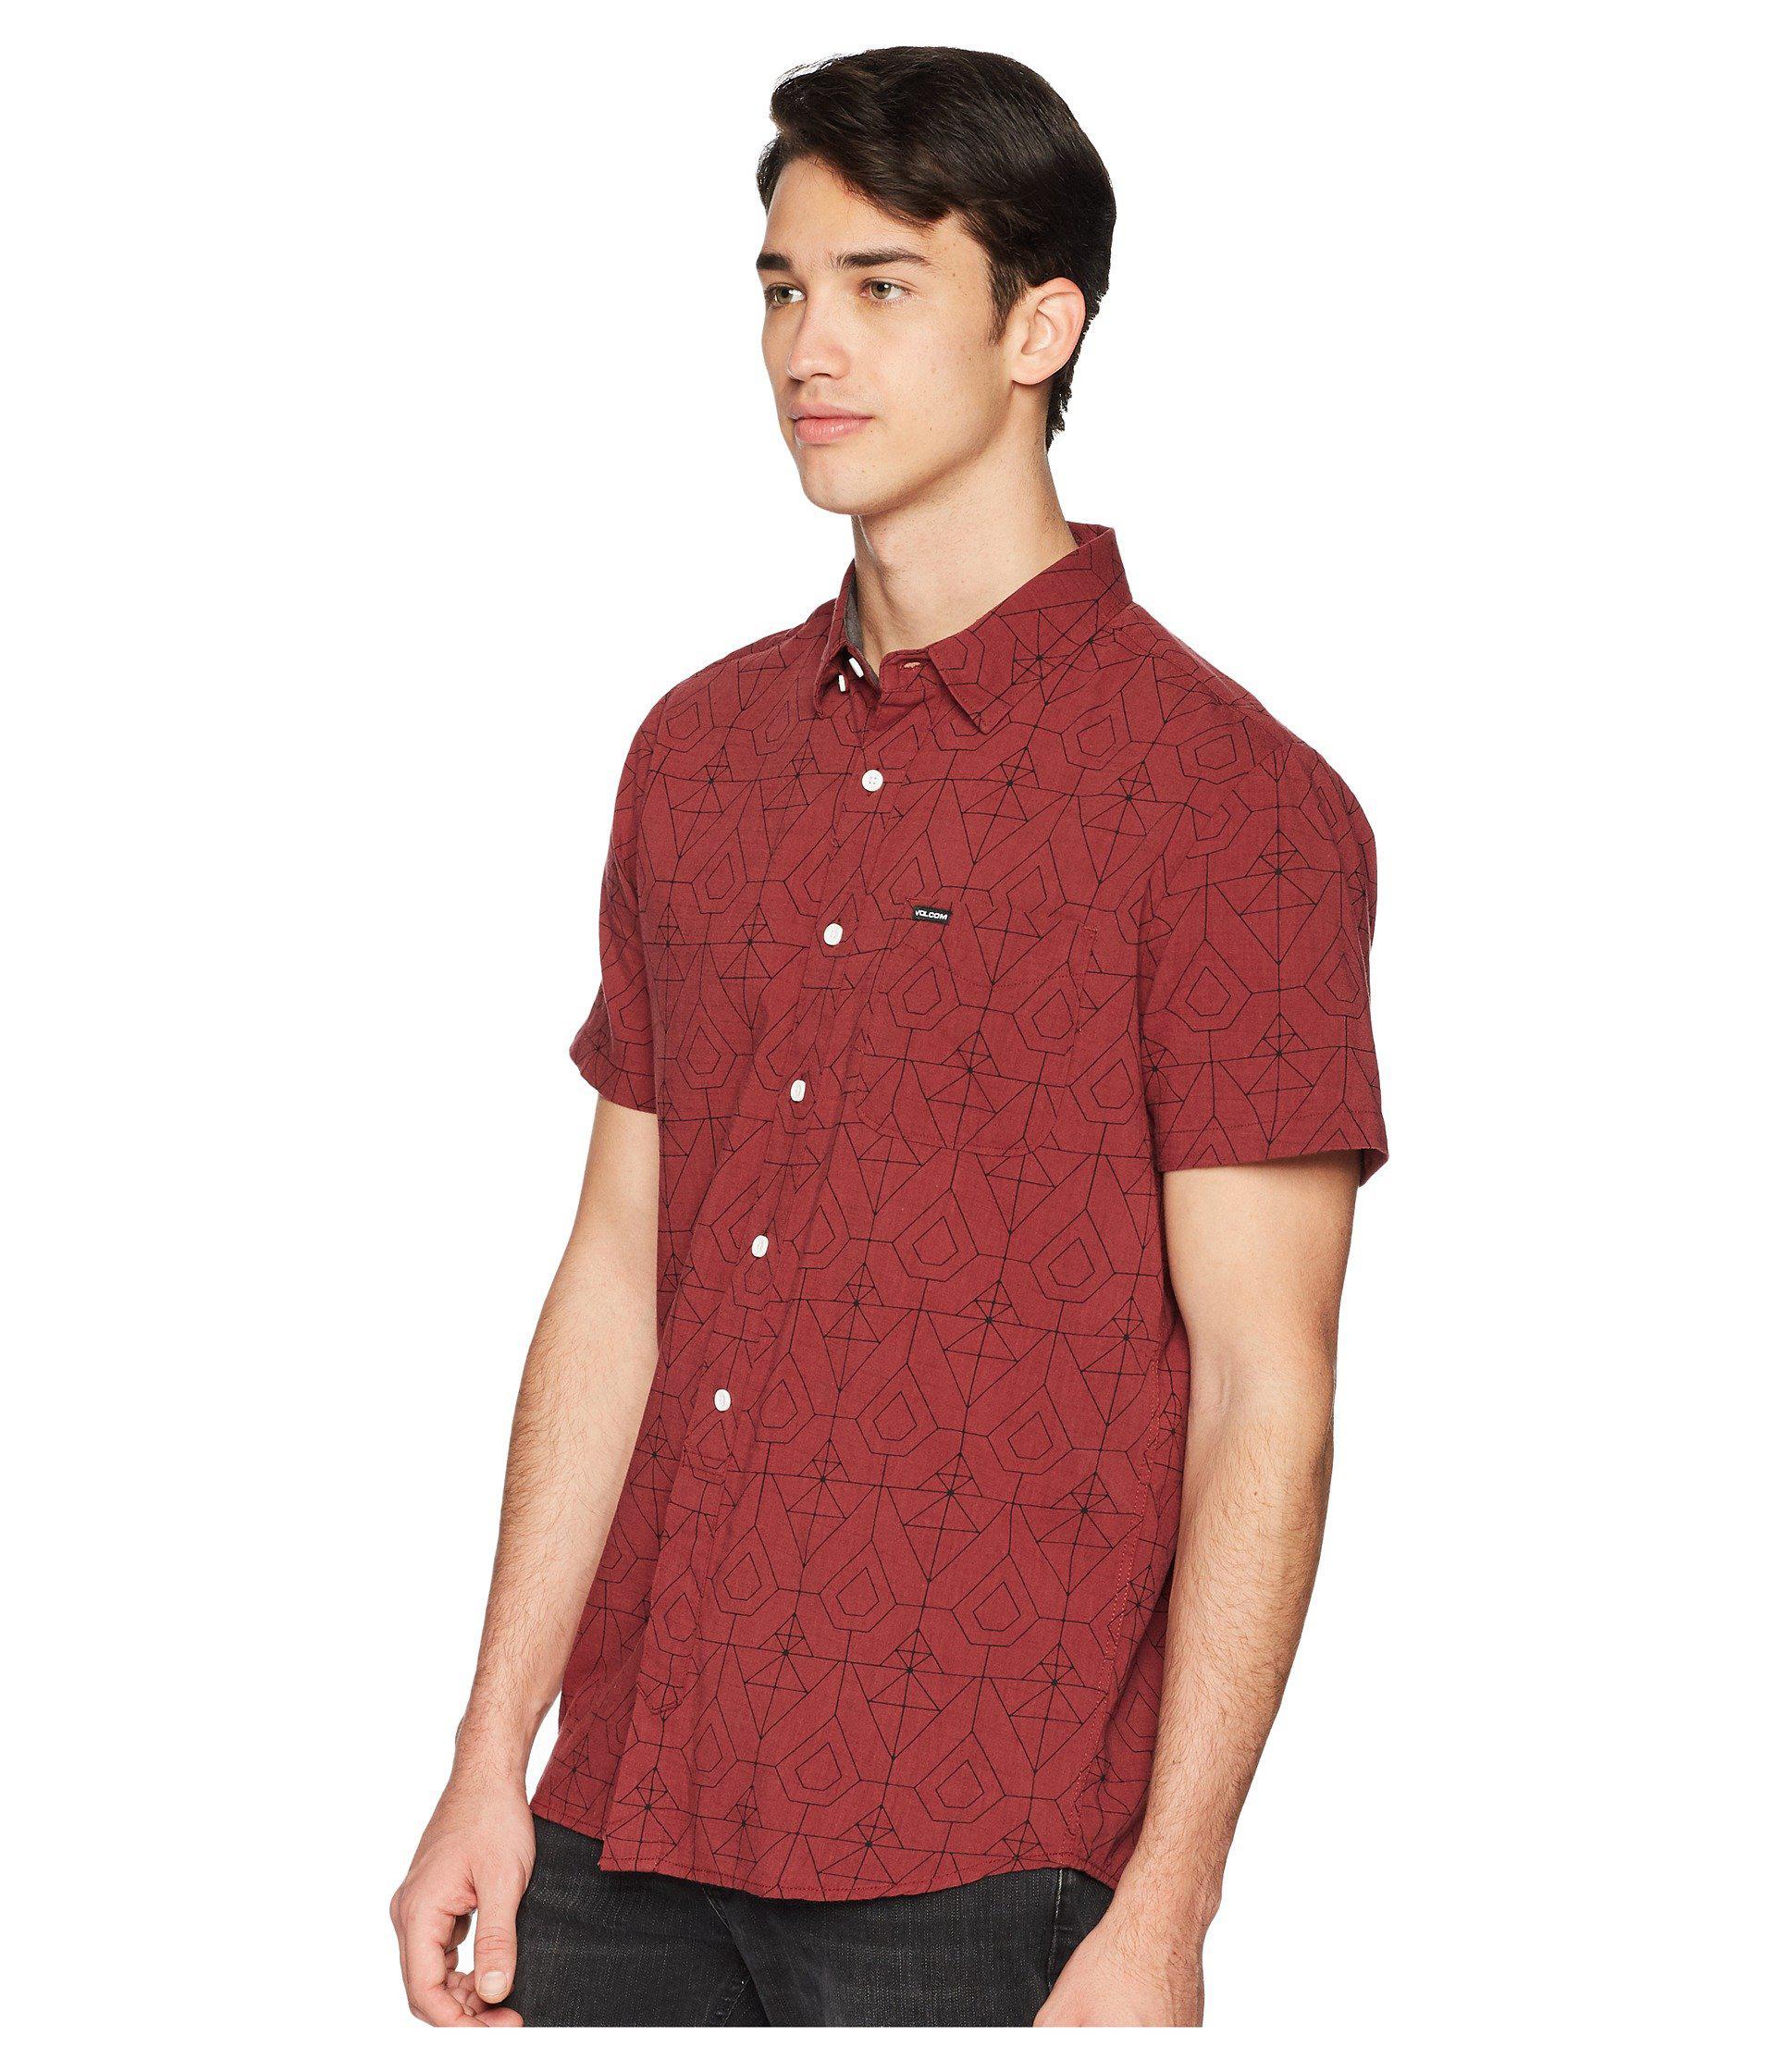 061b96d2ceb9 Lyst - Volcom Geo Print Short Sleeve Woven Shirt in Red for Men